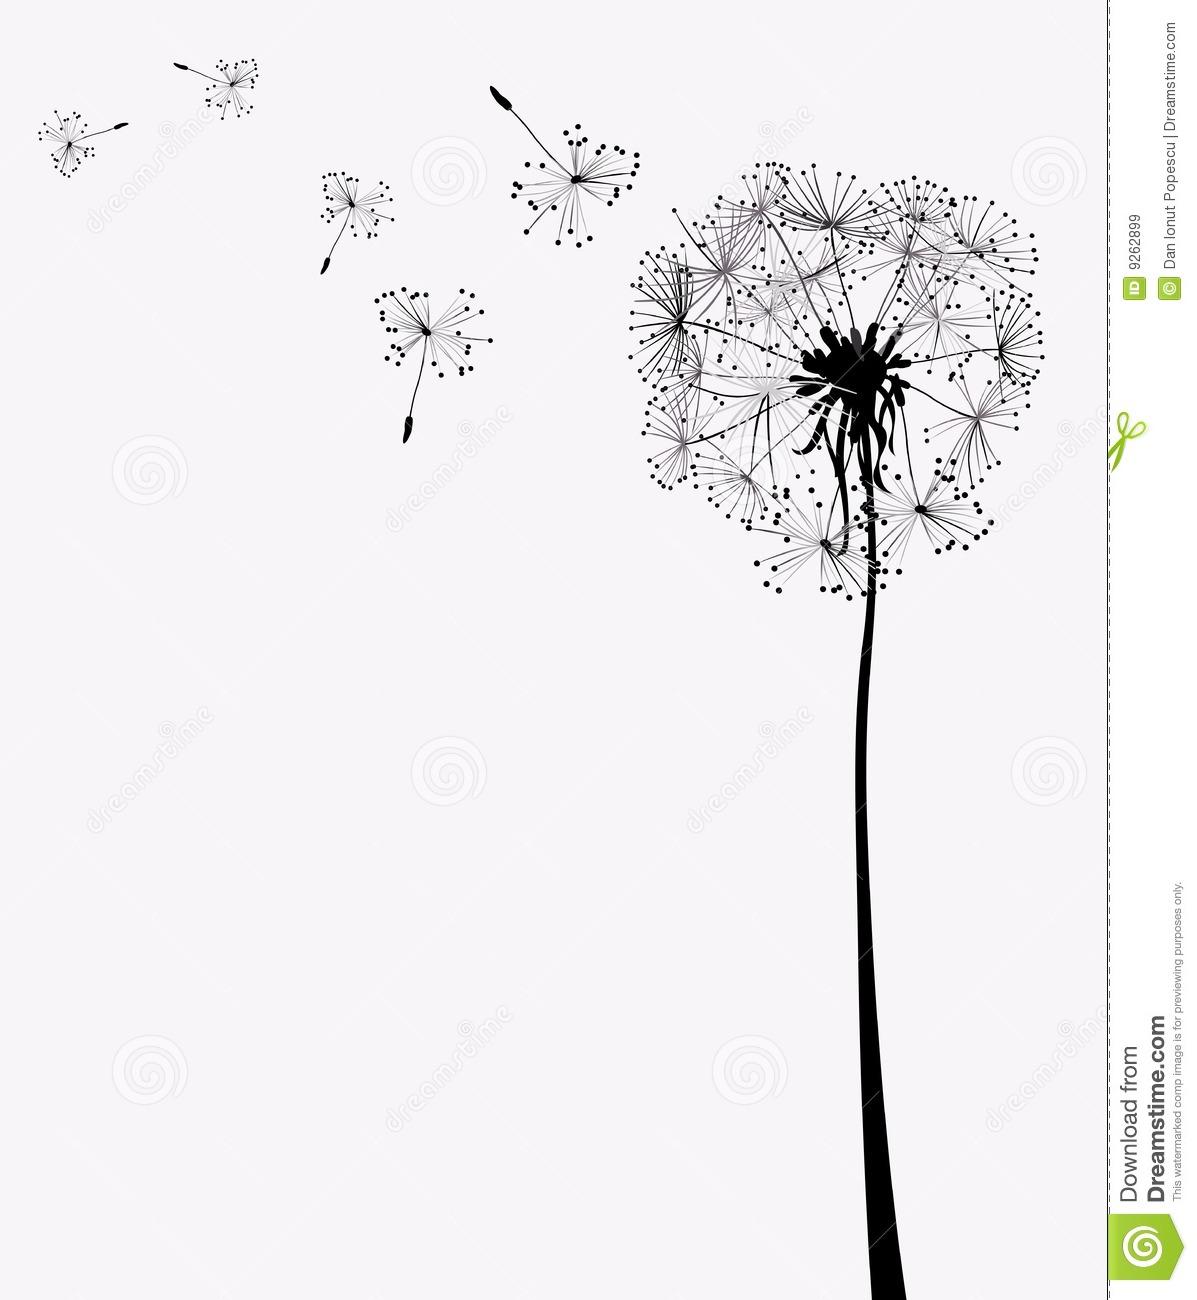 Dandelion clip art pictures jpg transparent download Dandelion clip art free - ClipartFest jpg transparent download